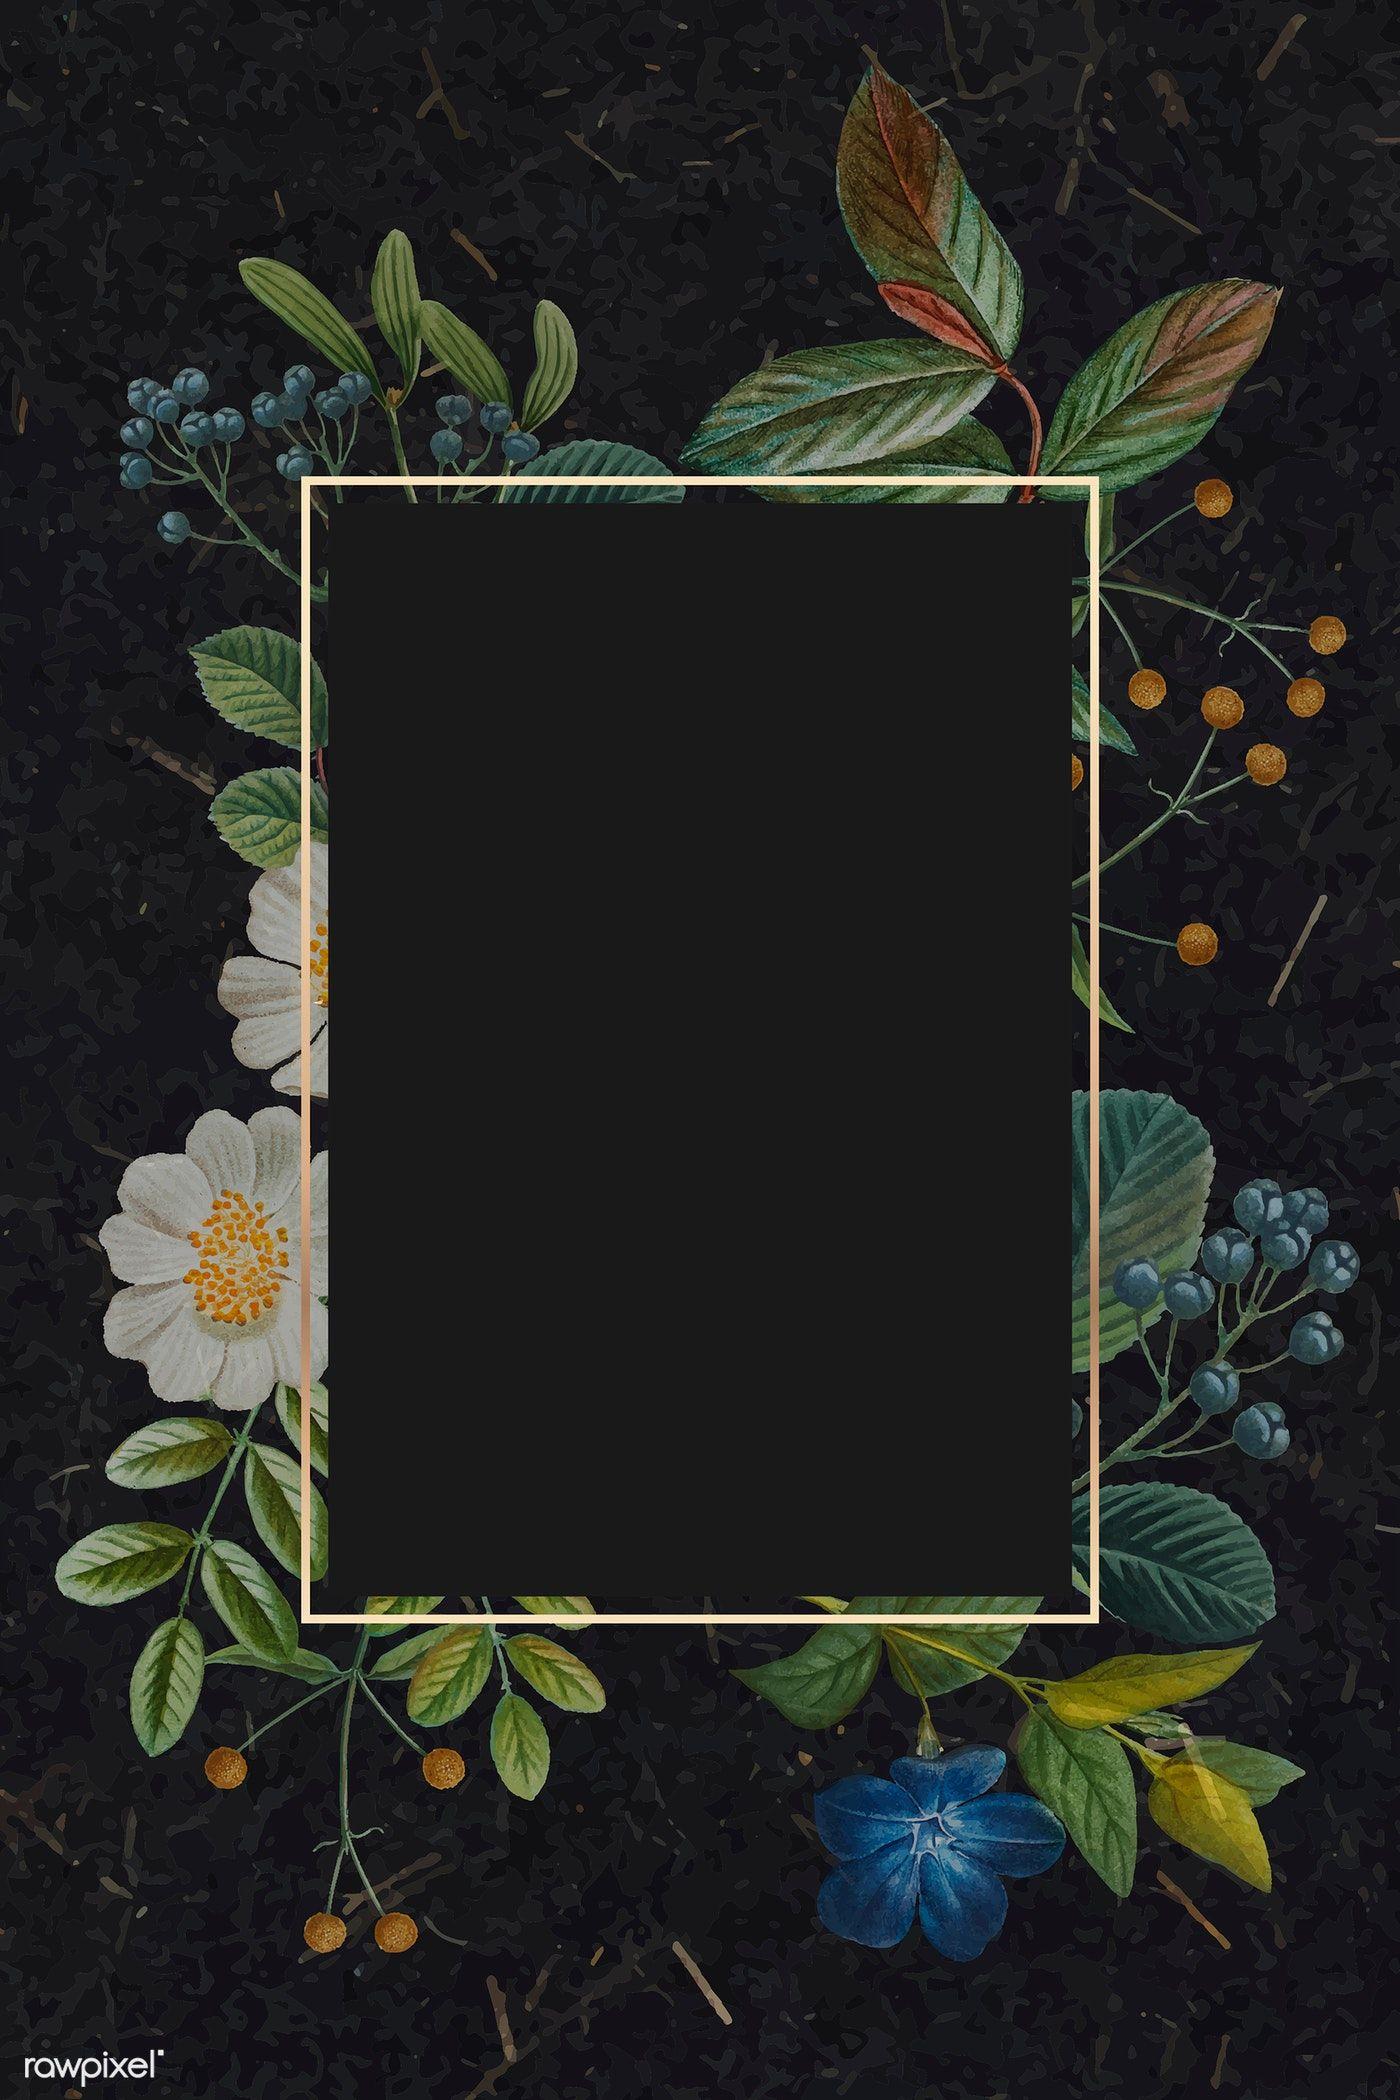 Golden Rectangle Floral Frame Vector Premium Image By Rawpixel Com Sasi Instagram Photo Frame Framed Wallpaper Photo Collage Template